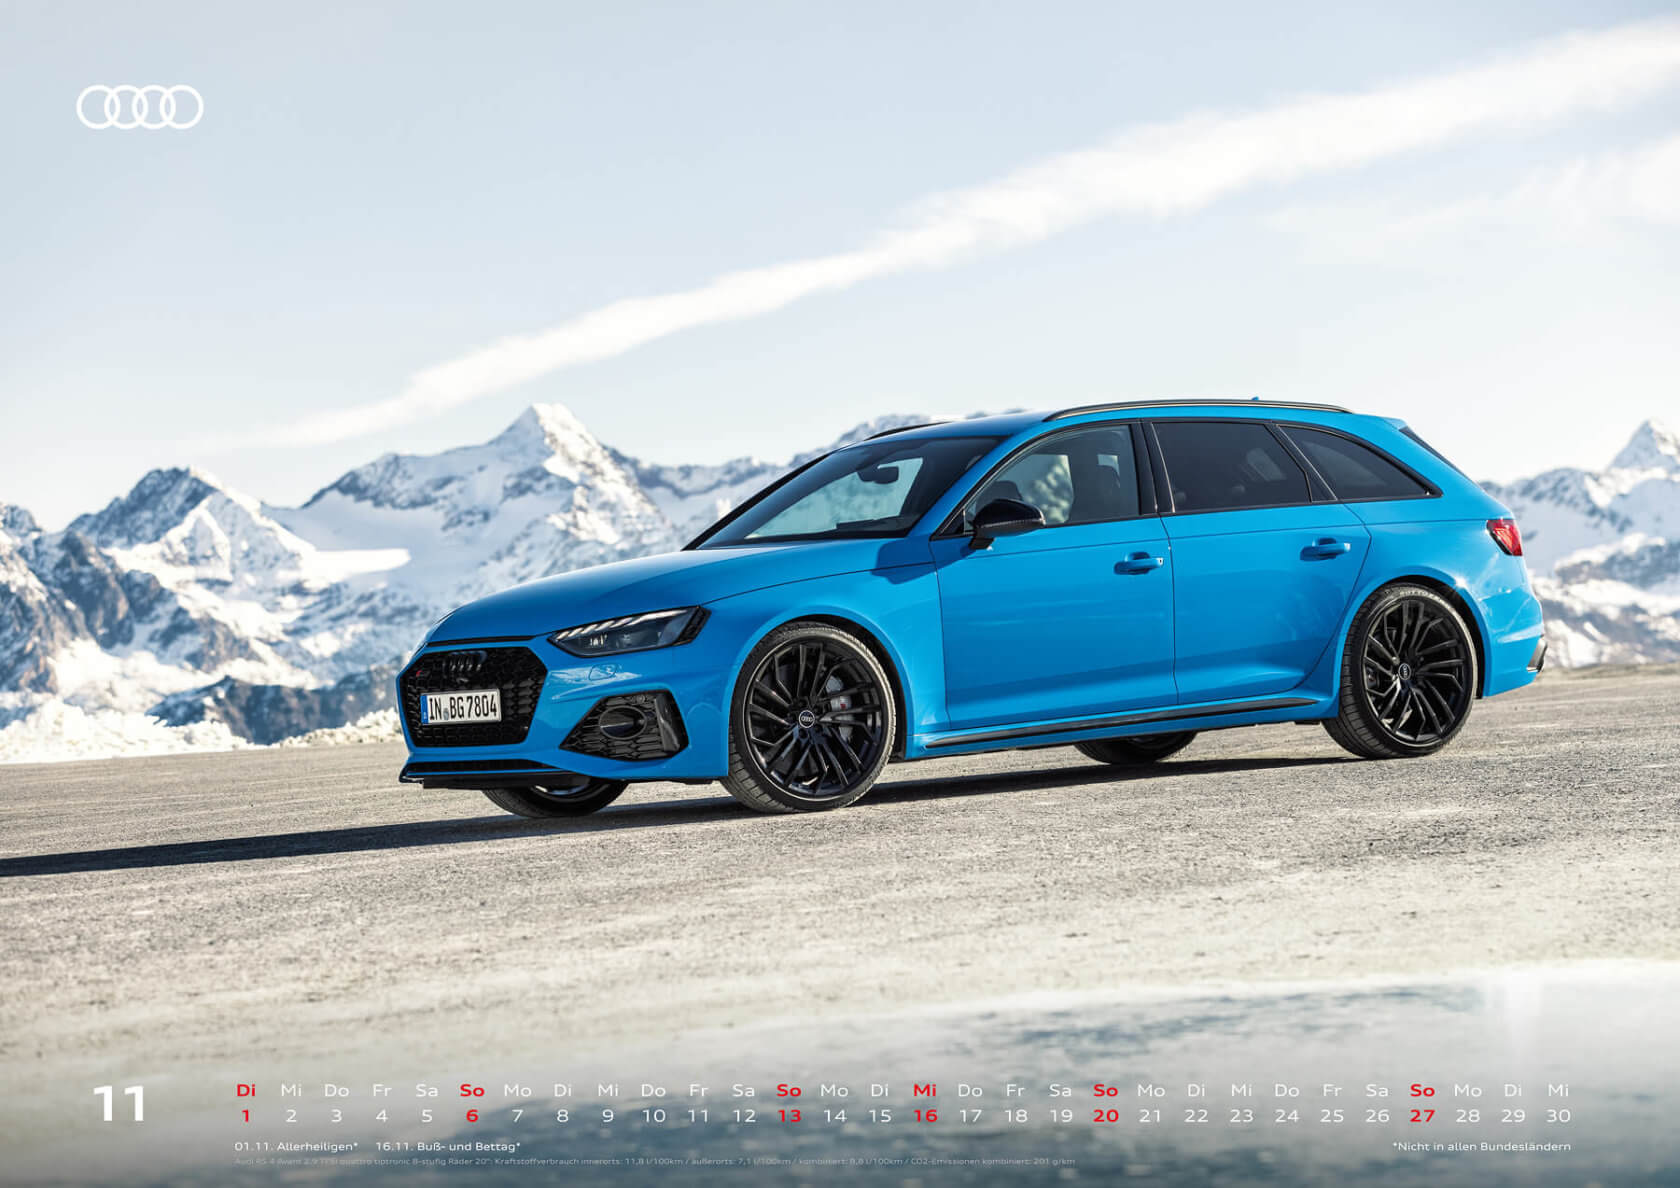 Audi Sport Kalender 2022 A2 November